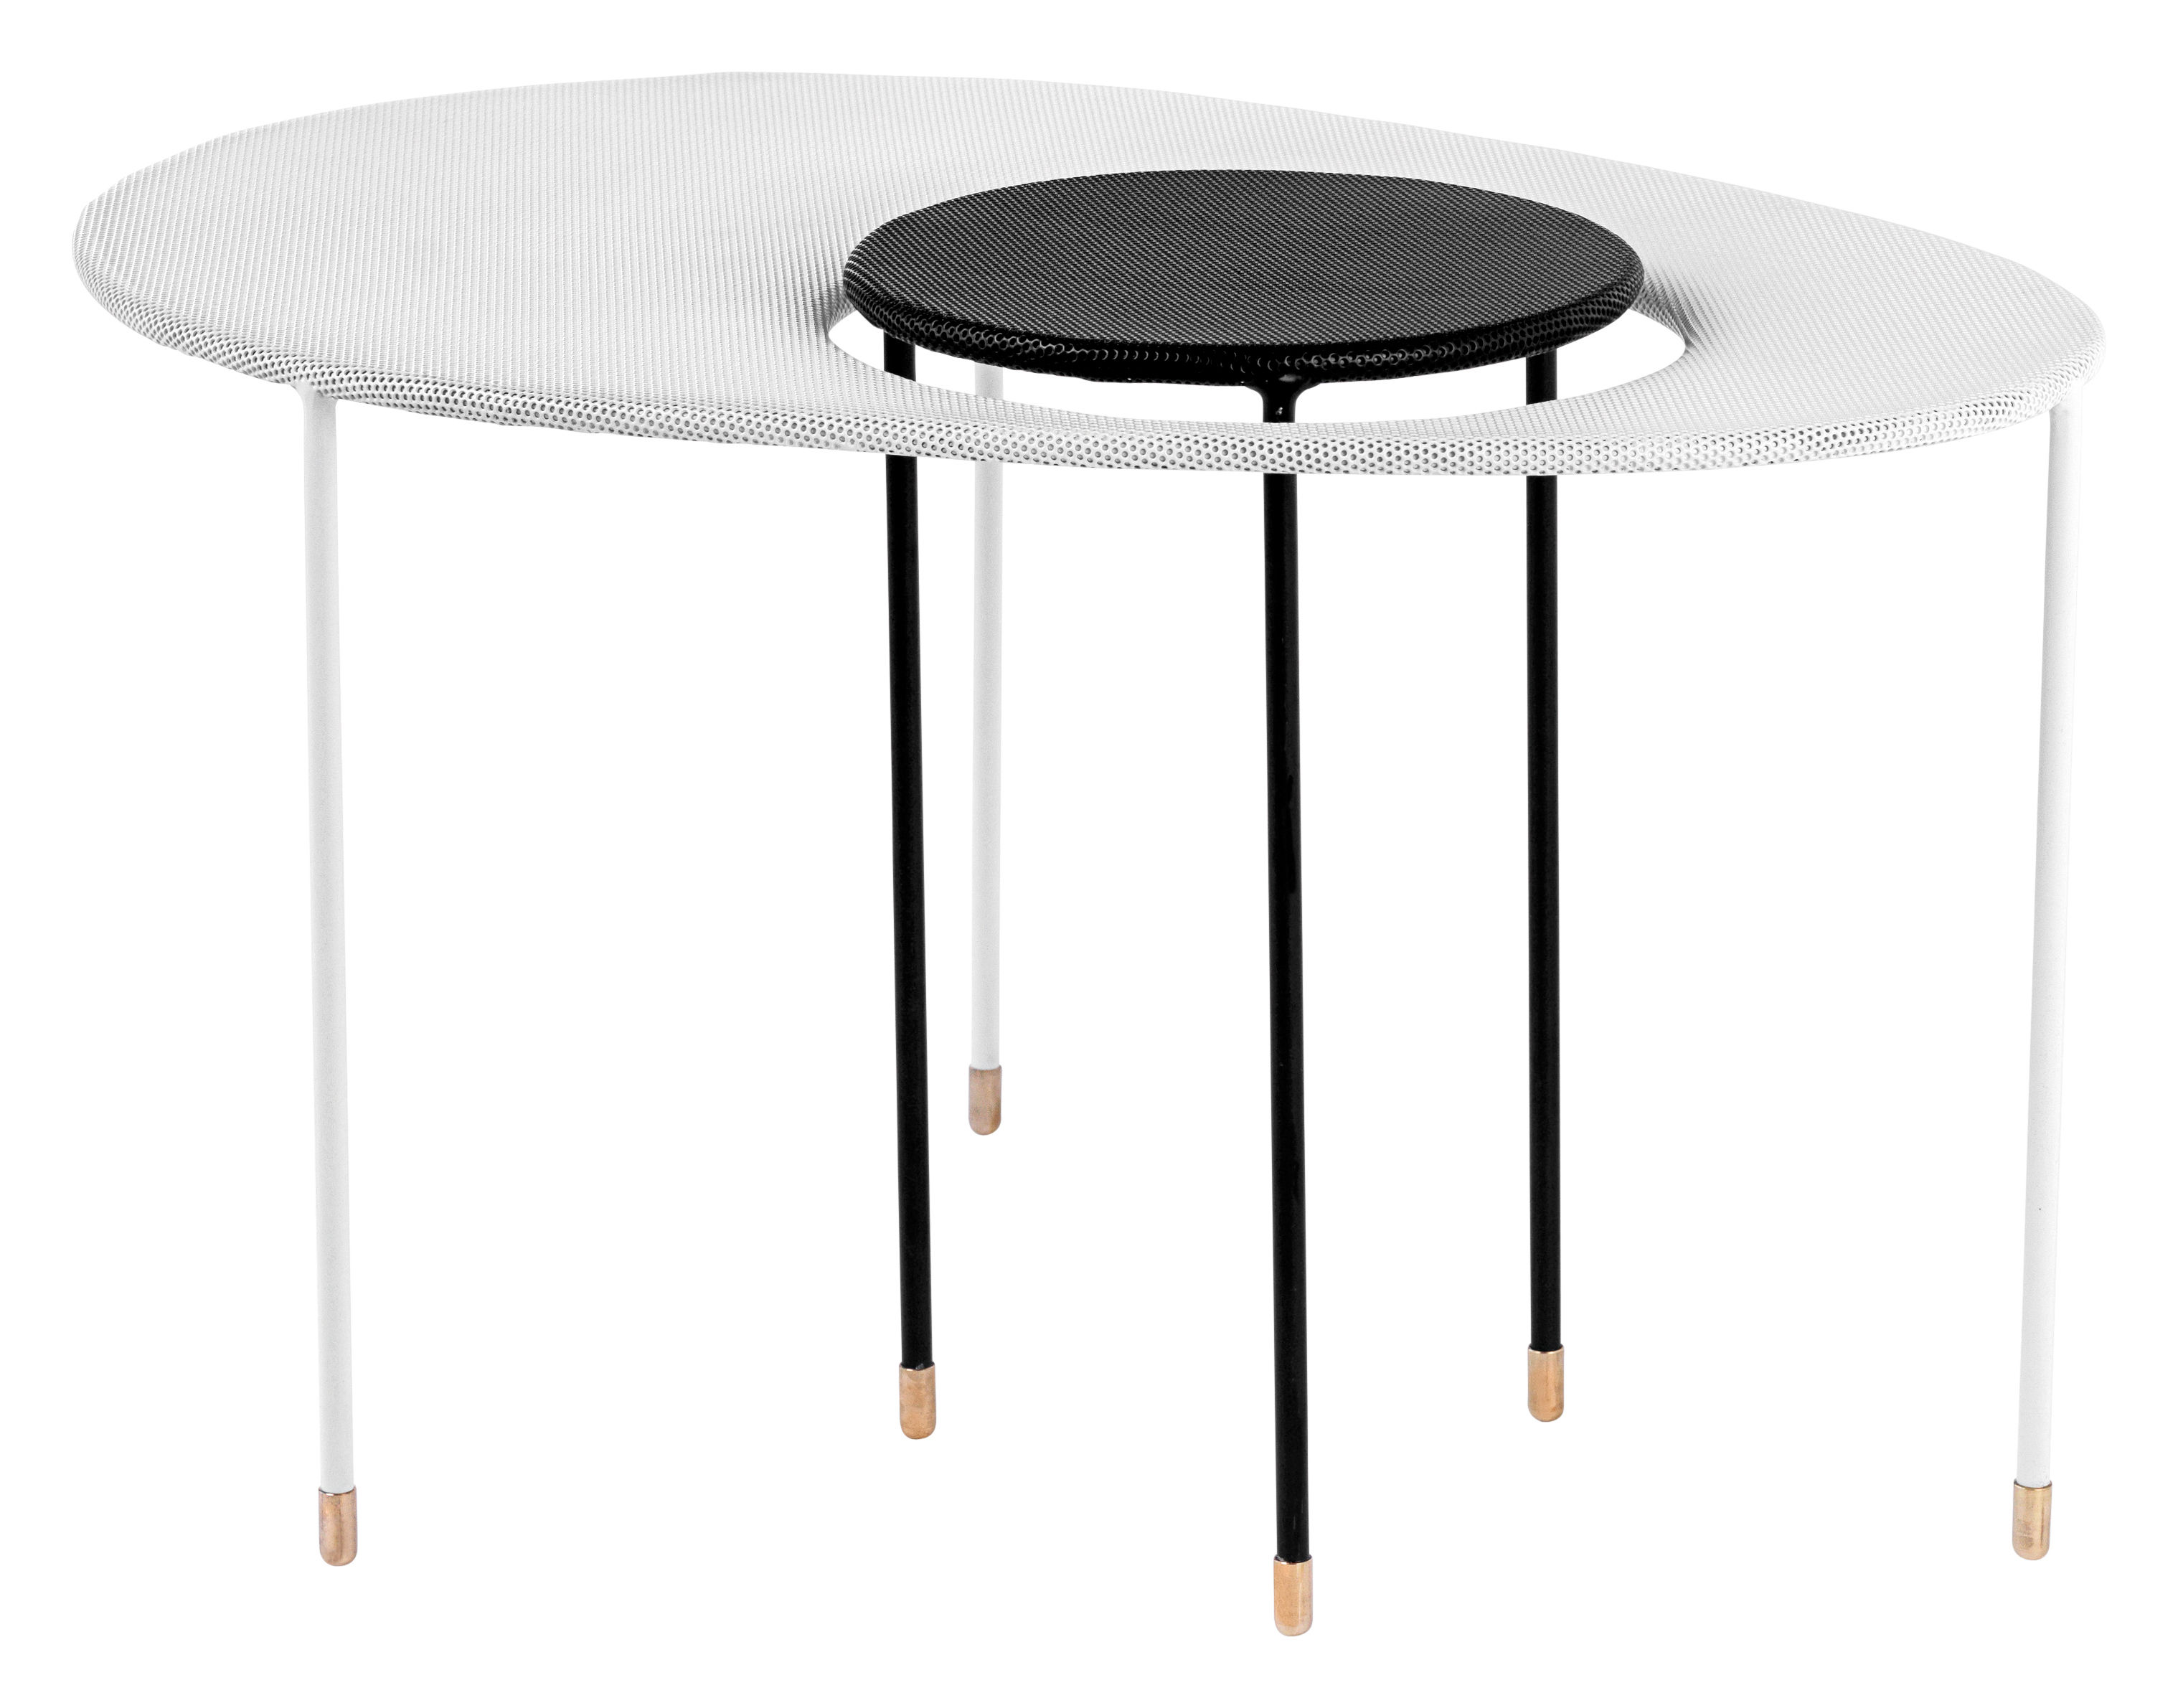 Arredamento - Tavolini  - Tavolini estraibili Kangourou - Set 2 tavoli sovrapponibili - Rieditata 50' di Gubi - Bianco / nero - Acciaio inossidabile